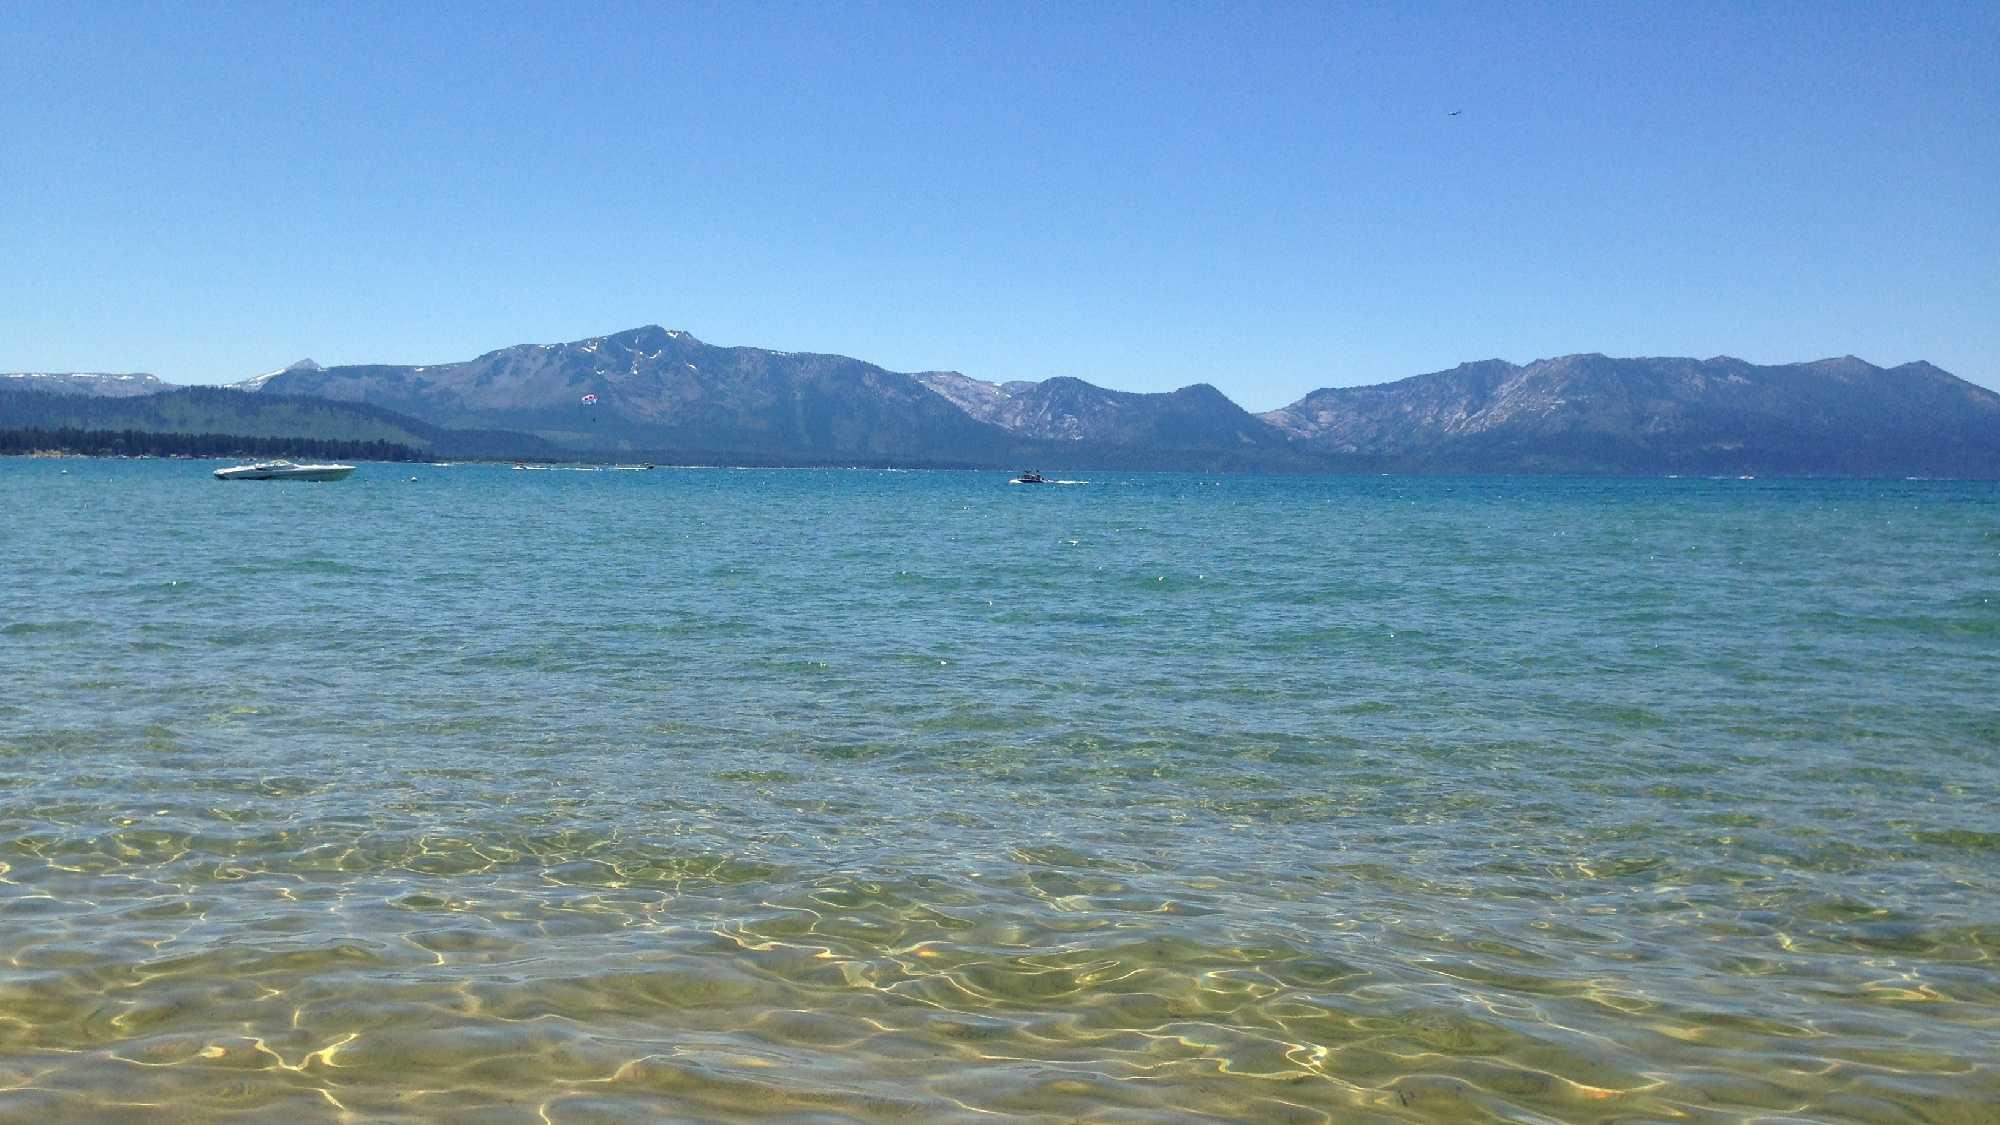 Lake Tahoe development plan upheld in appeals court